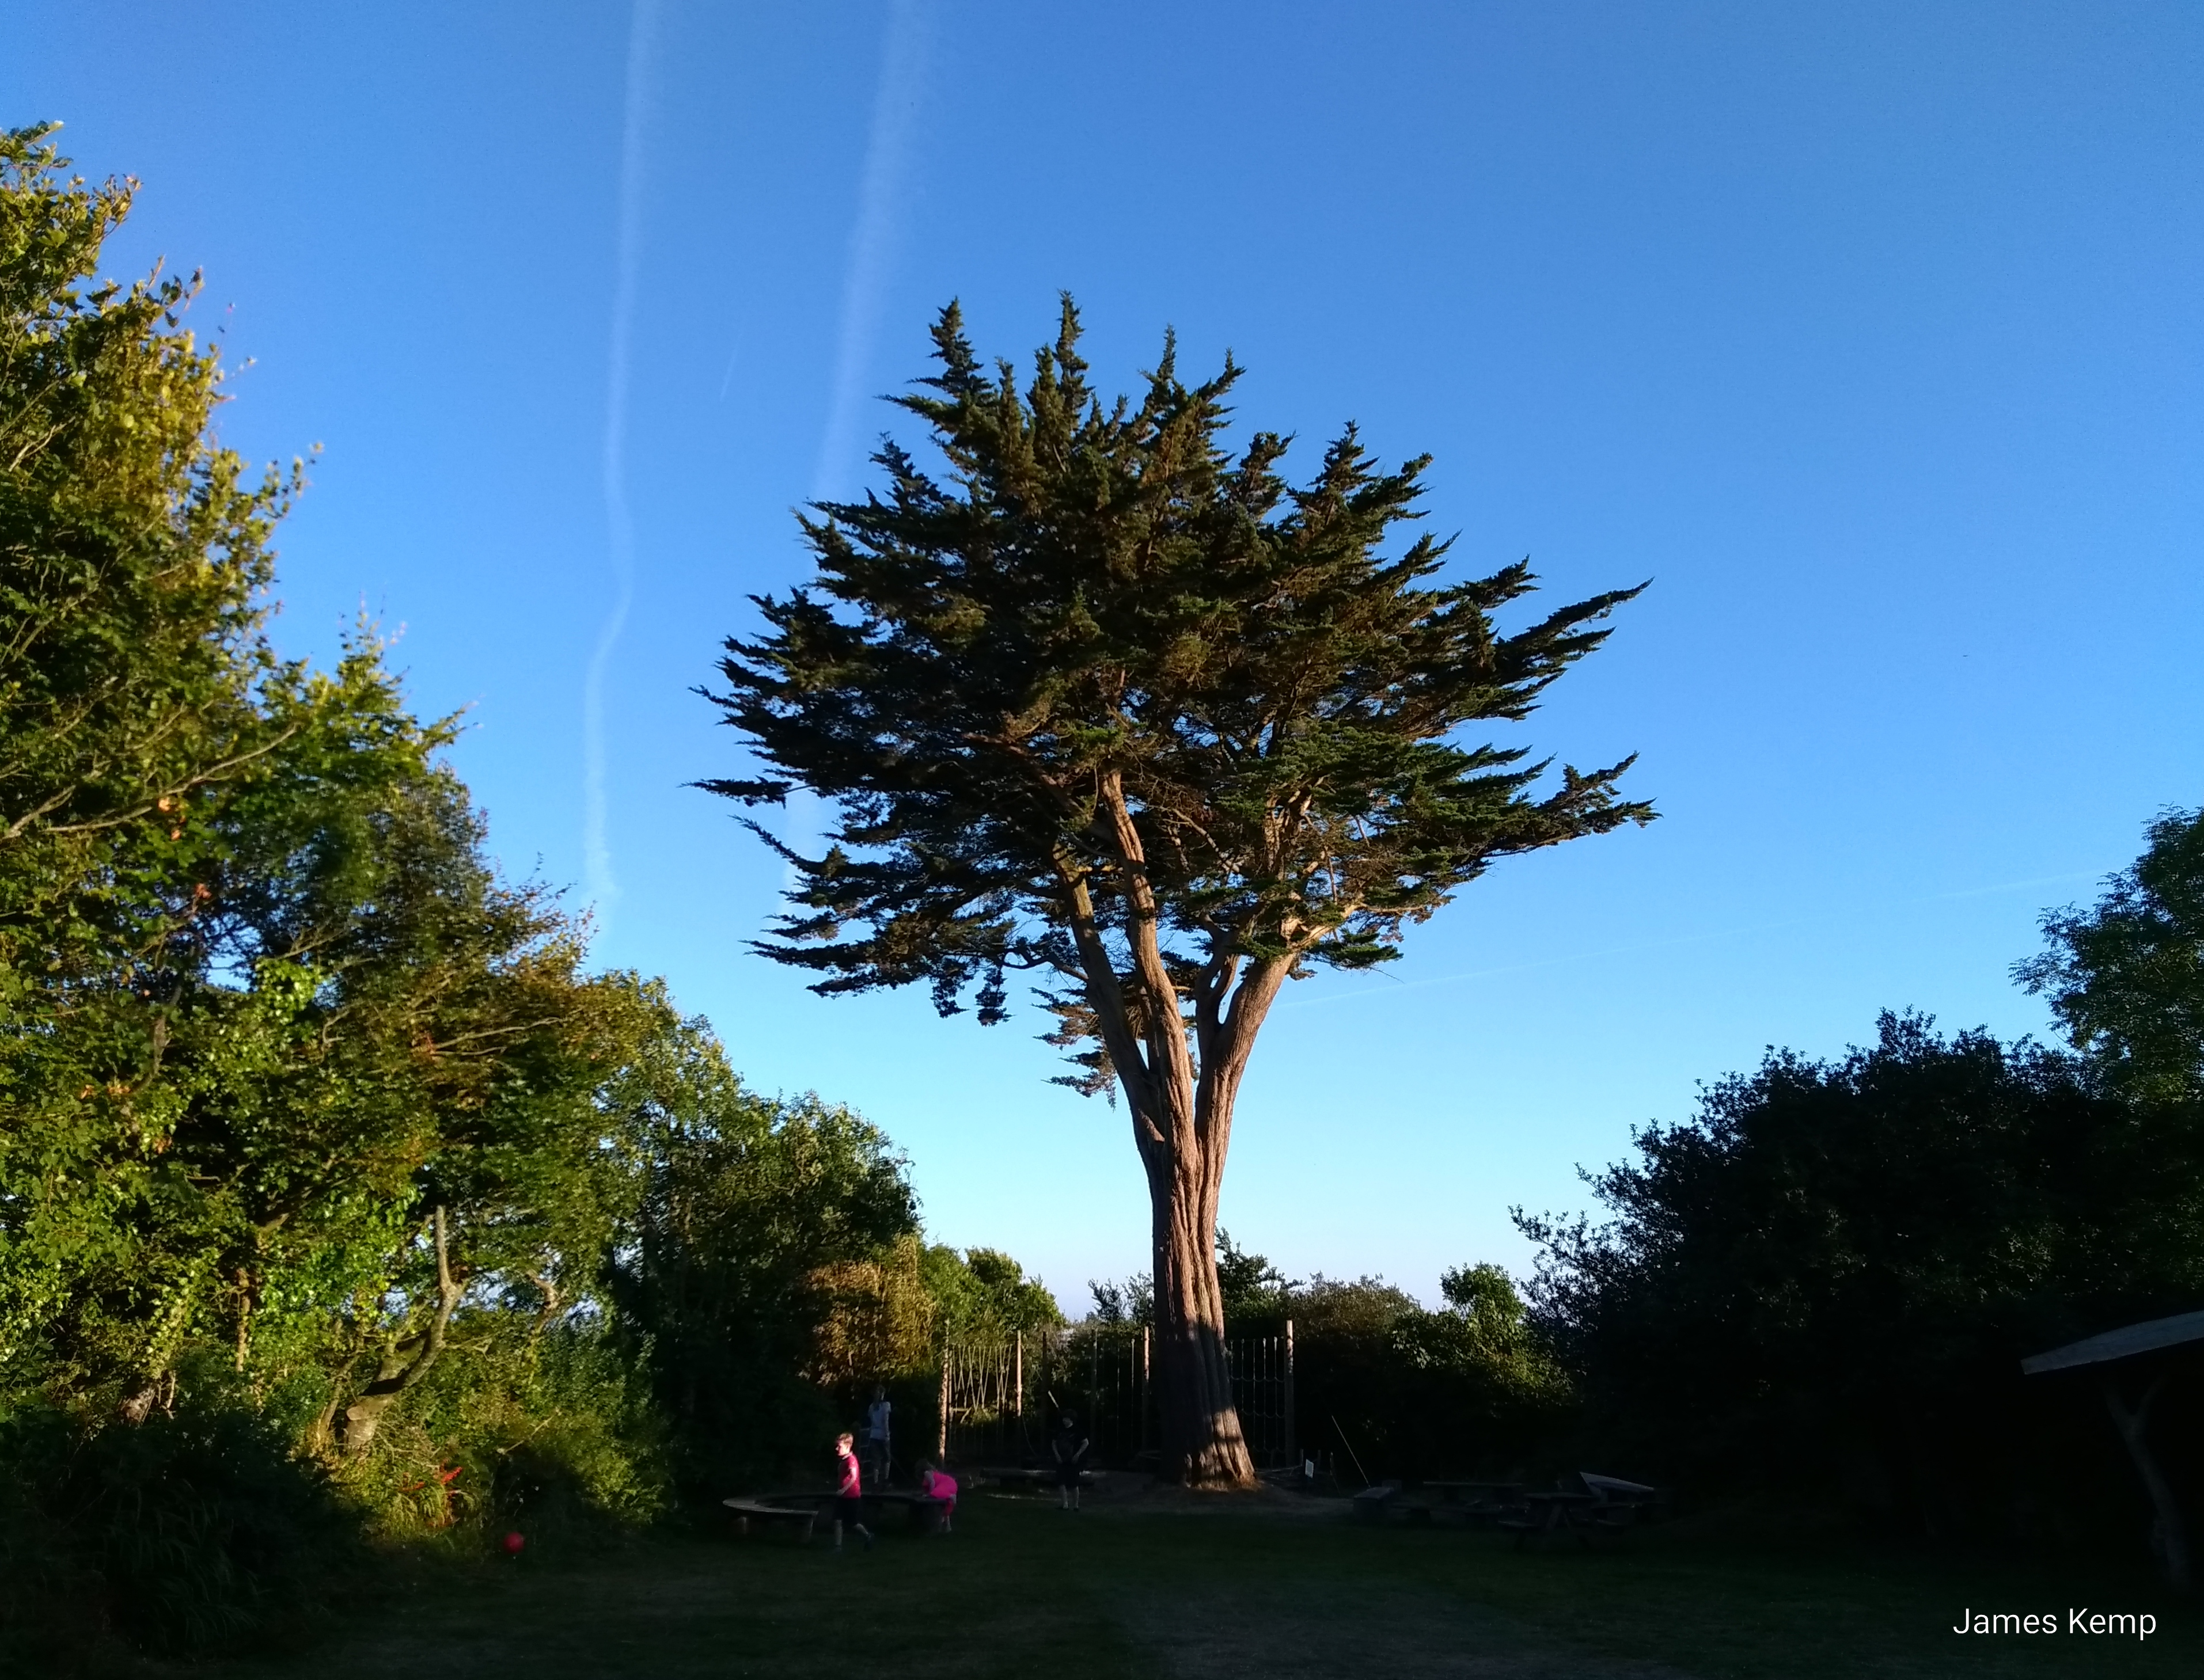 The back garden in the real family holidays centre in Slapton, Devon (photo: James Kemp)